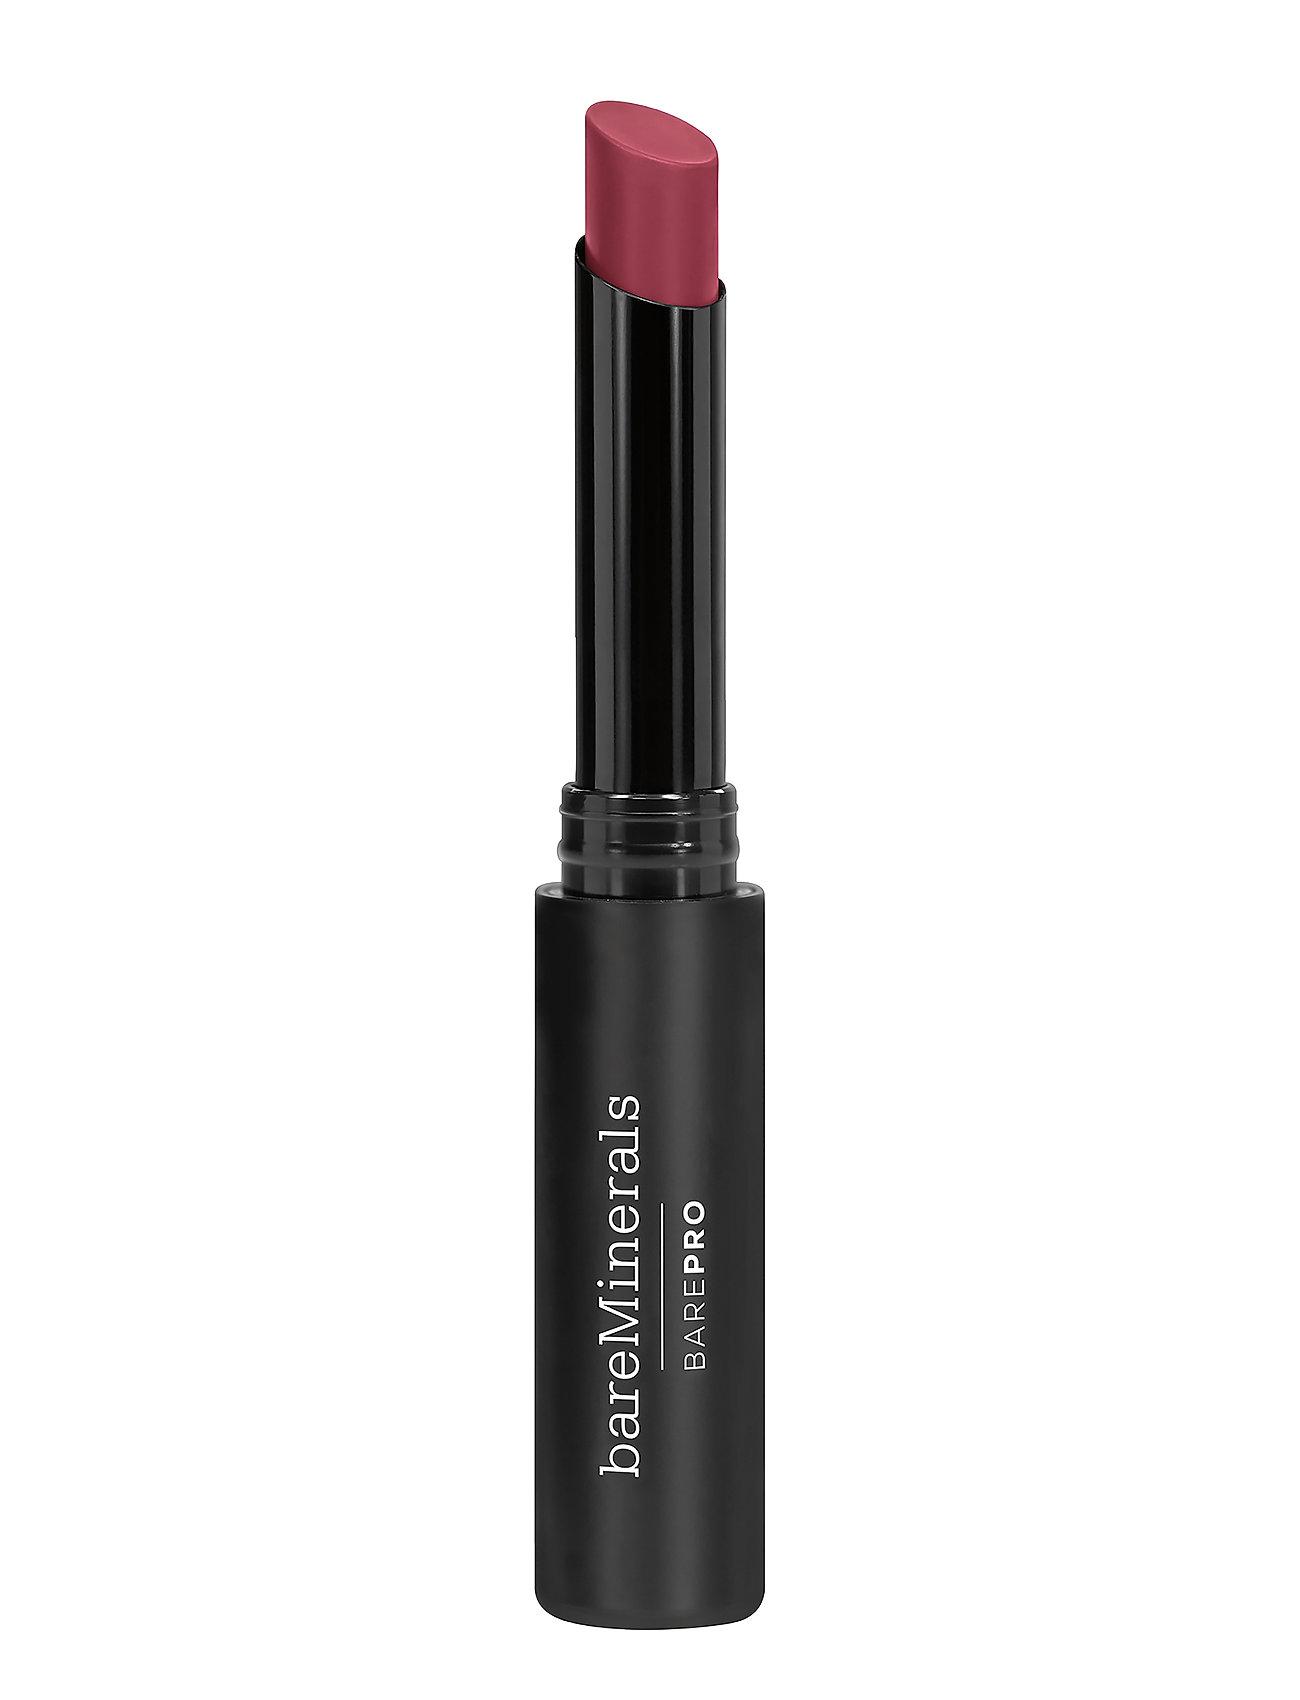 Image of Barepro Longwear Lipstick Strawberry Læbestift Makeup Rød BareMinerals (3138616949)